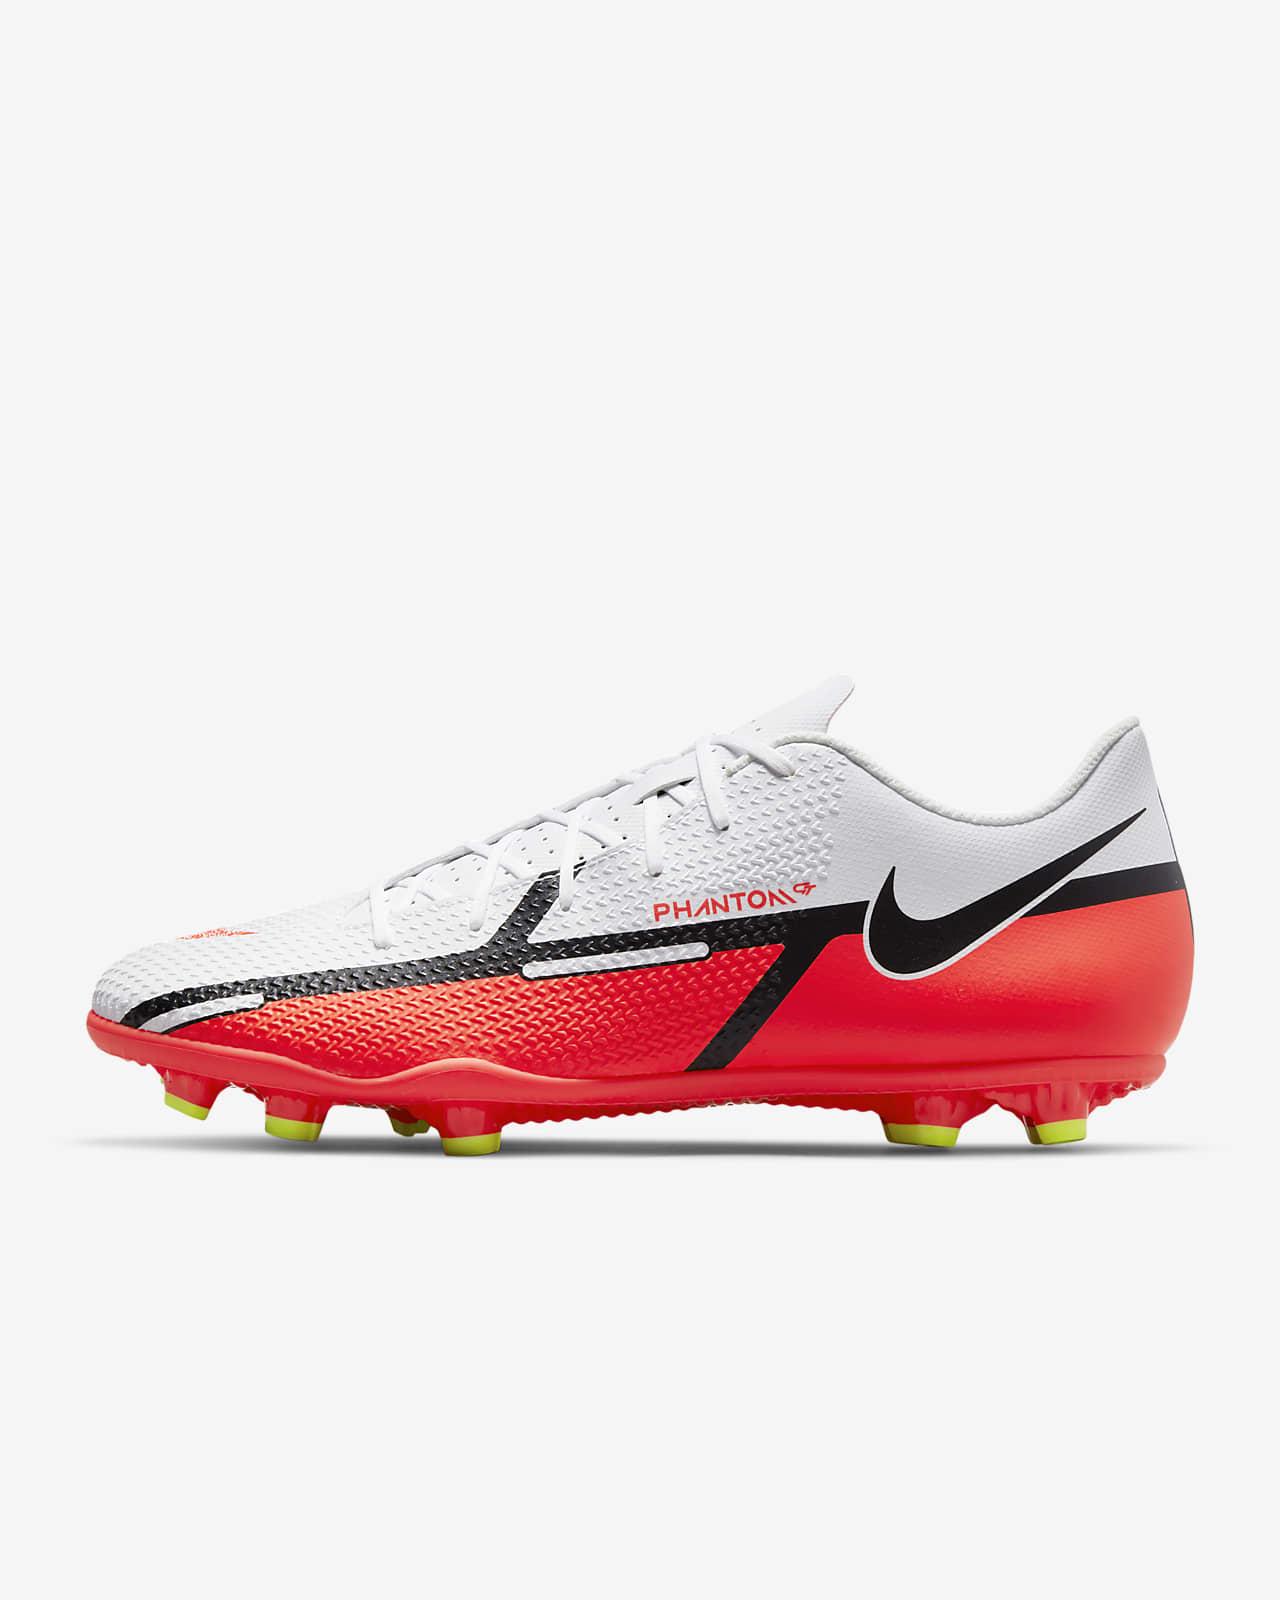 Nike Phantom GT2 Club MG Multi-Ground Football Boot